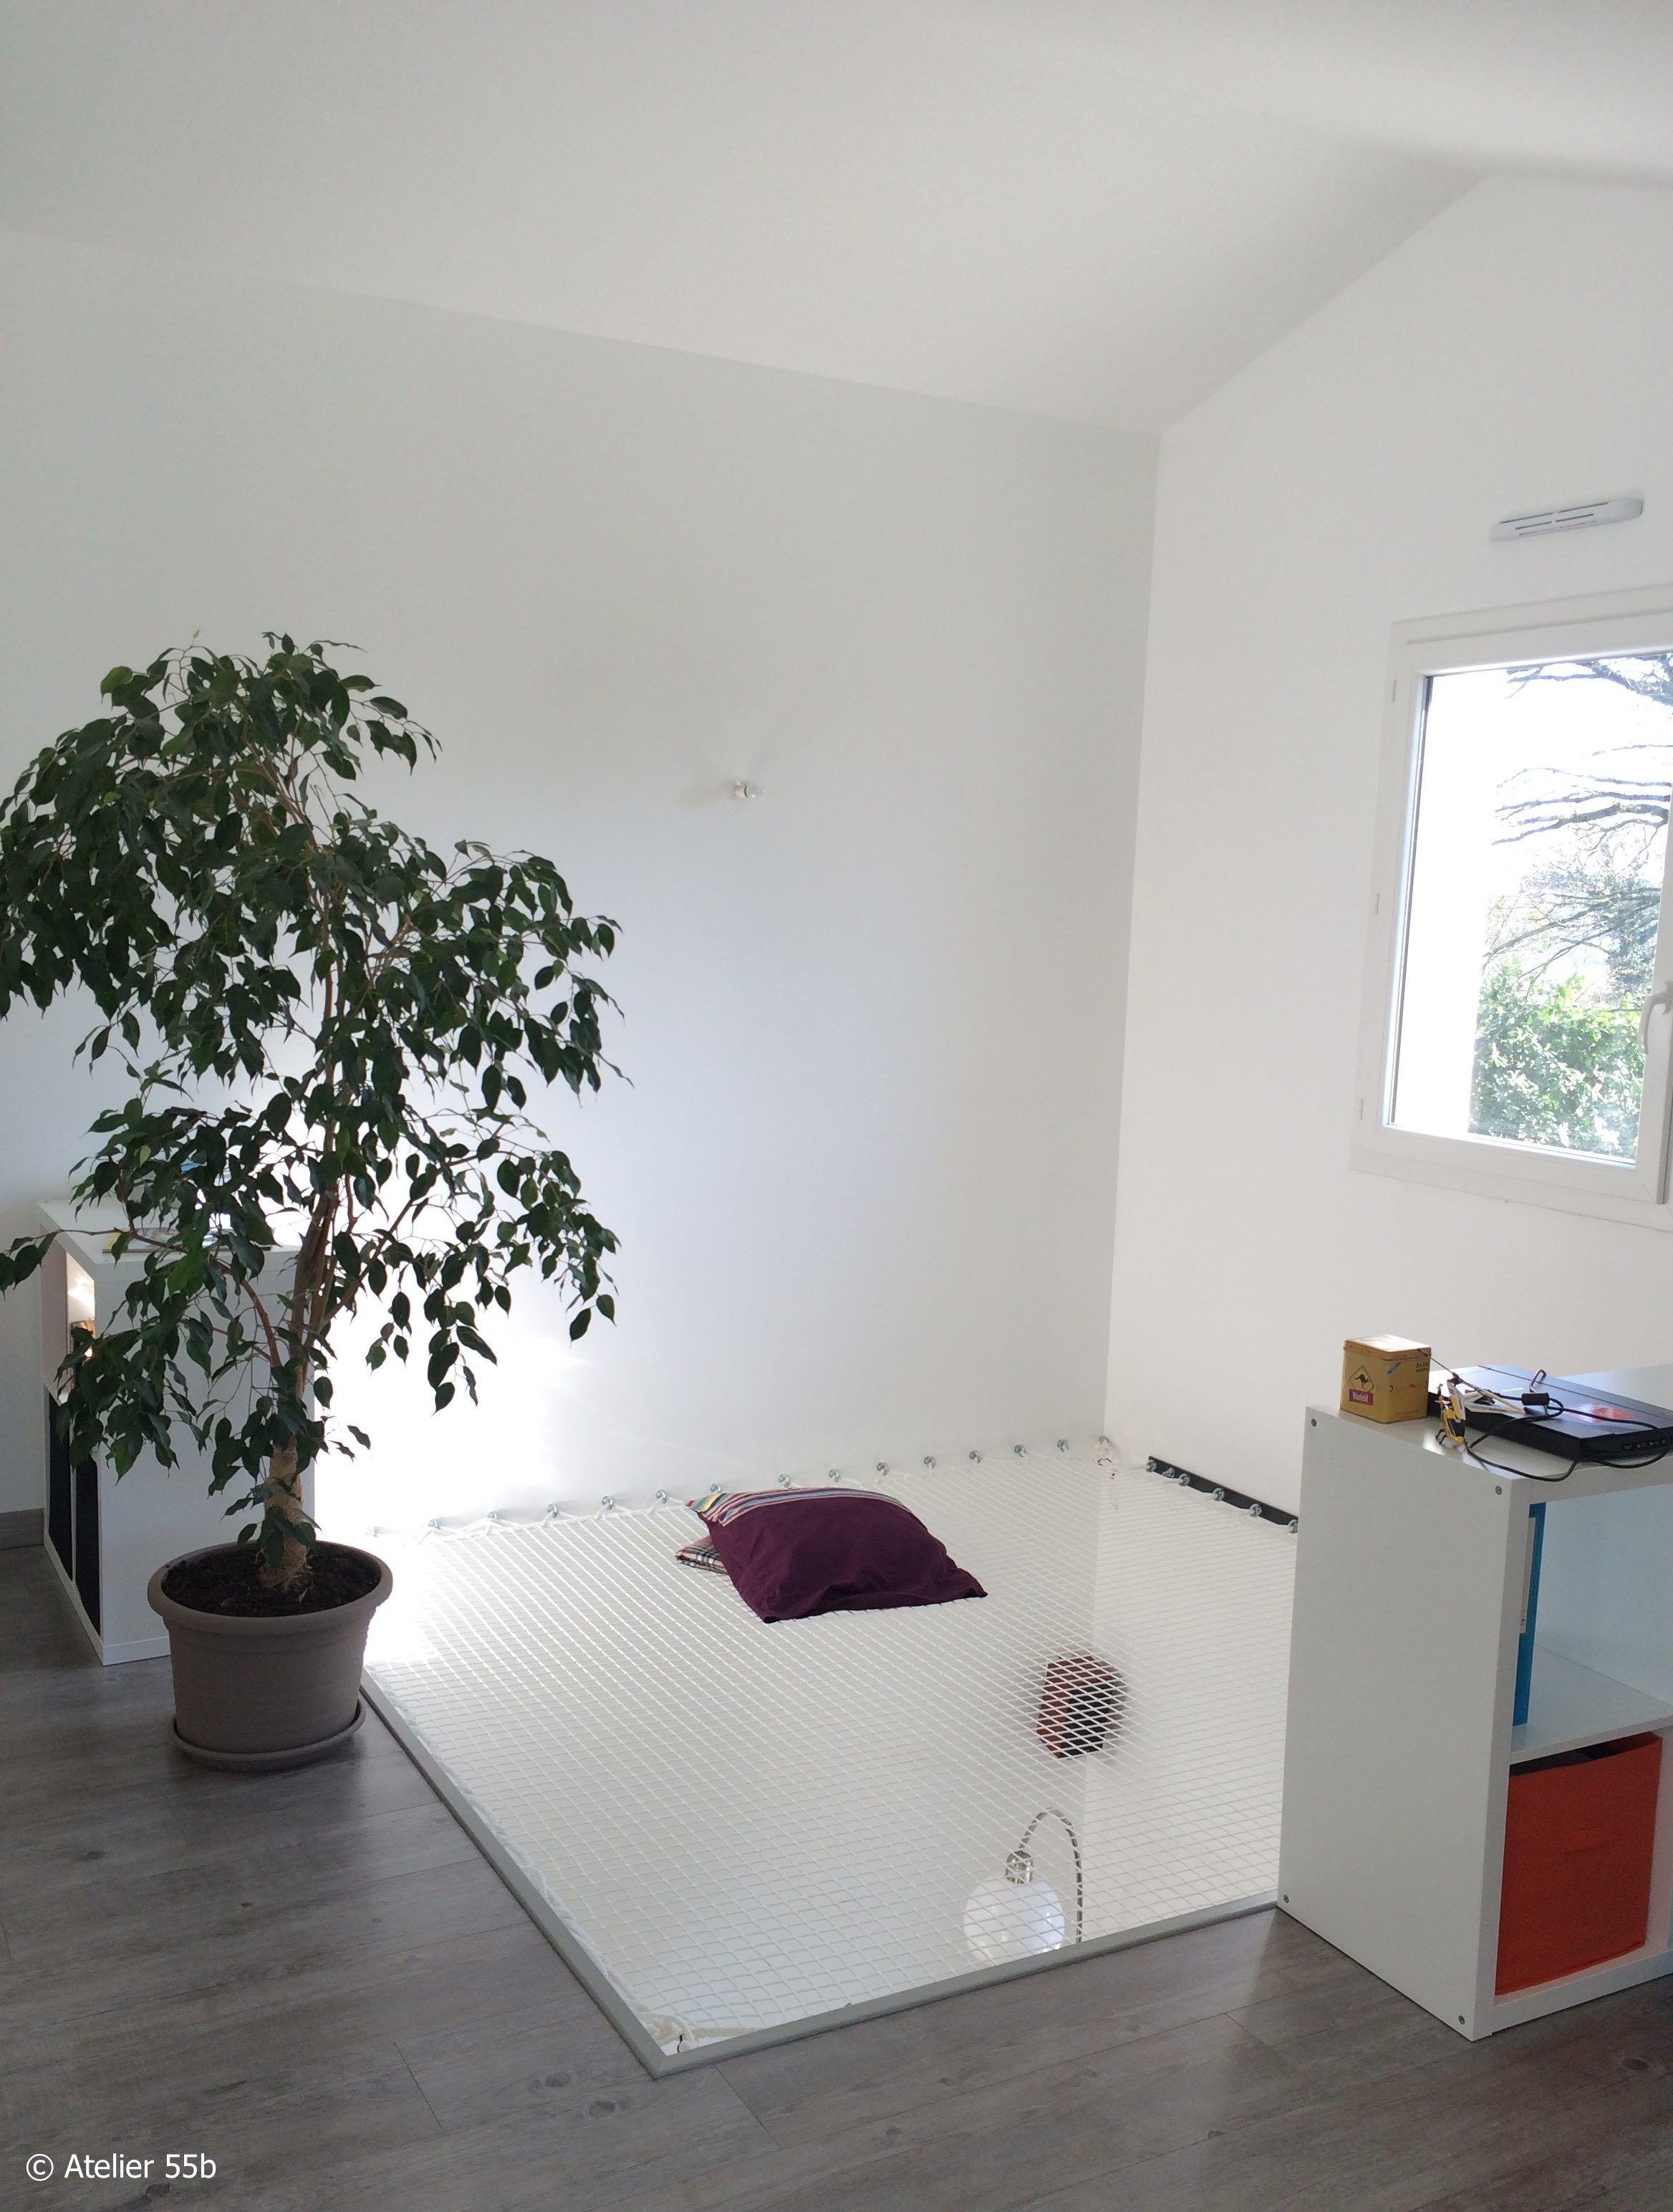 filet d 39 habitation vu depuis la mezzanine netz. Black Bedroom Furniture Sets. Home Design Ideas